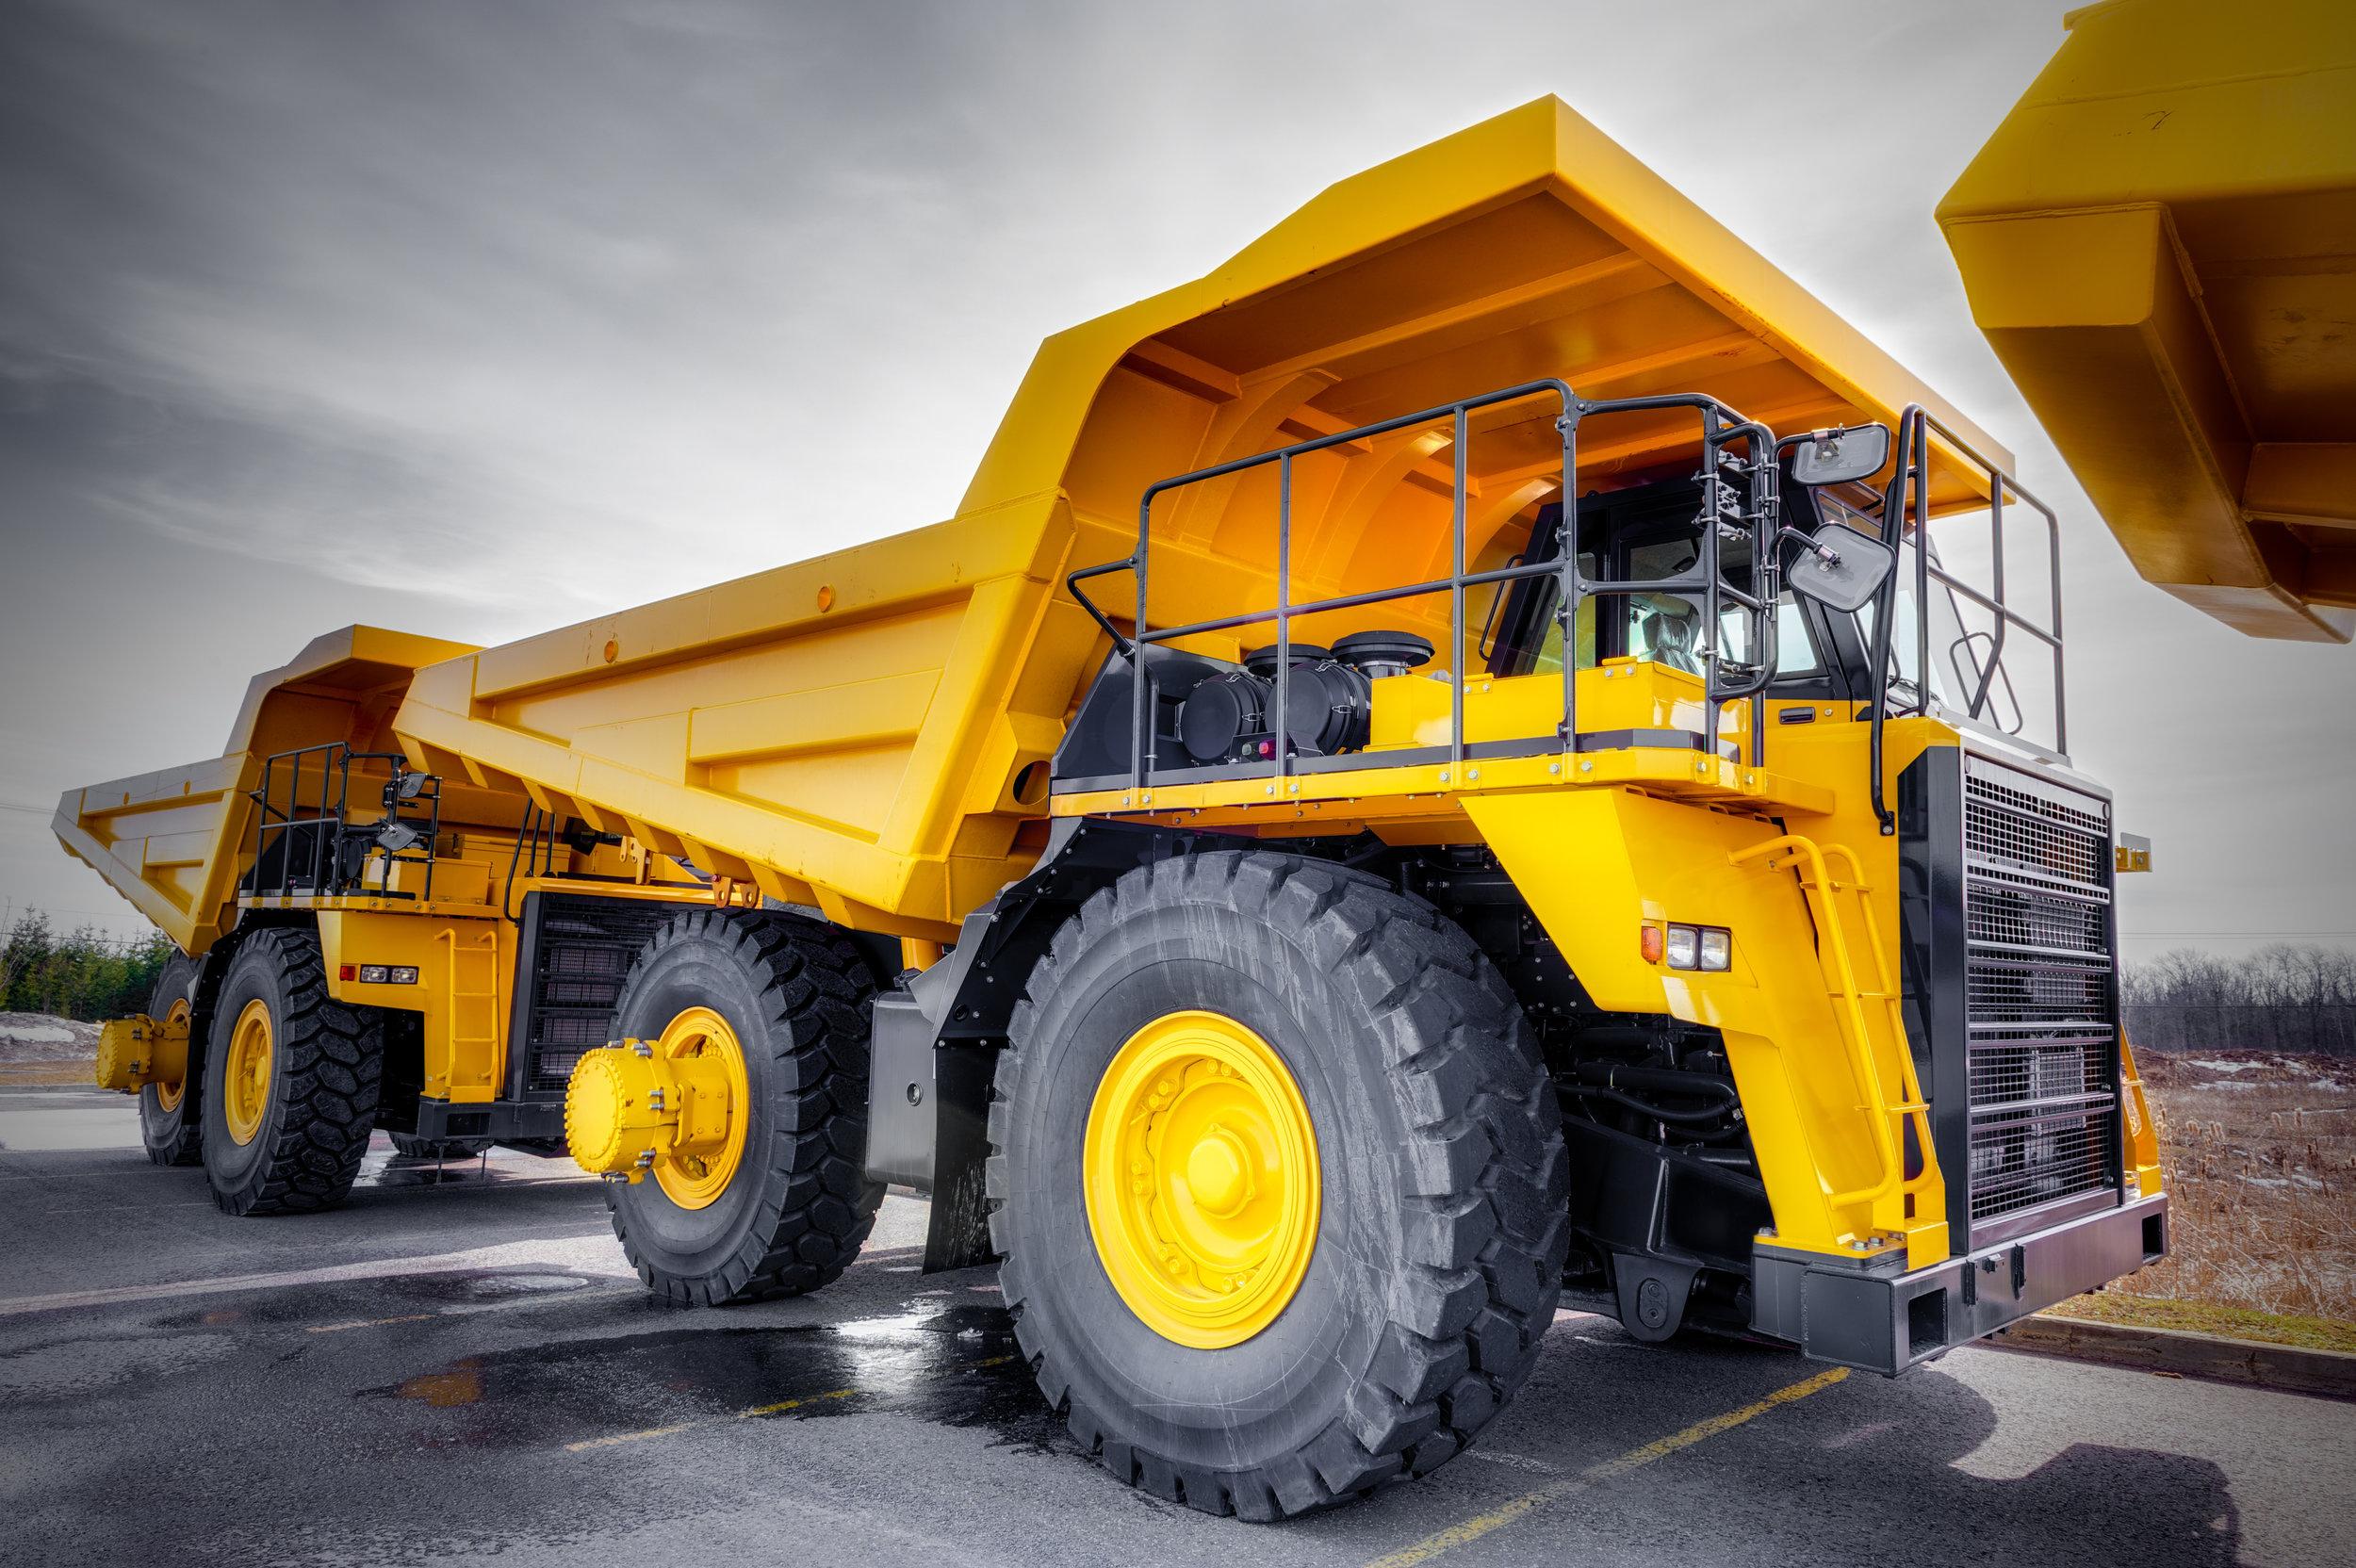 Haul Truck Equipment Rental